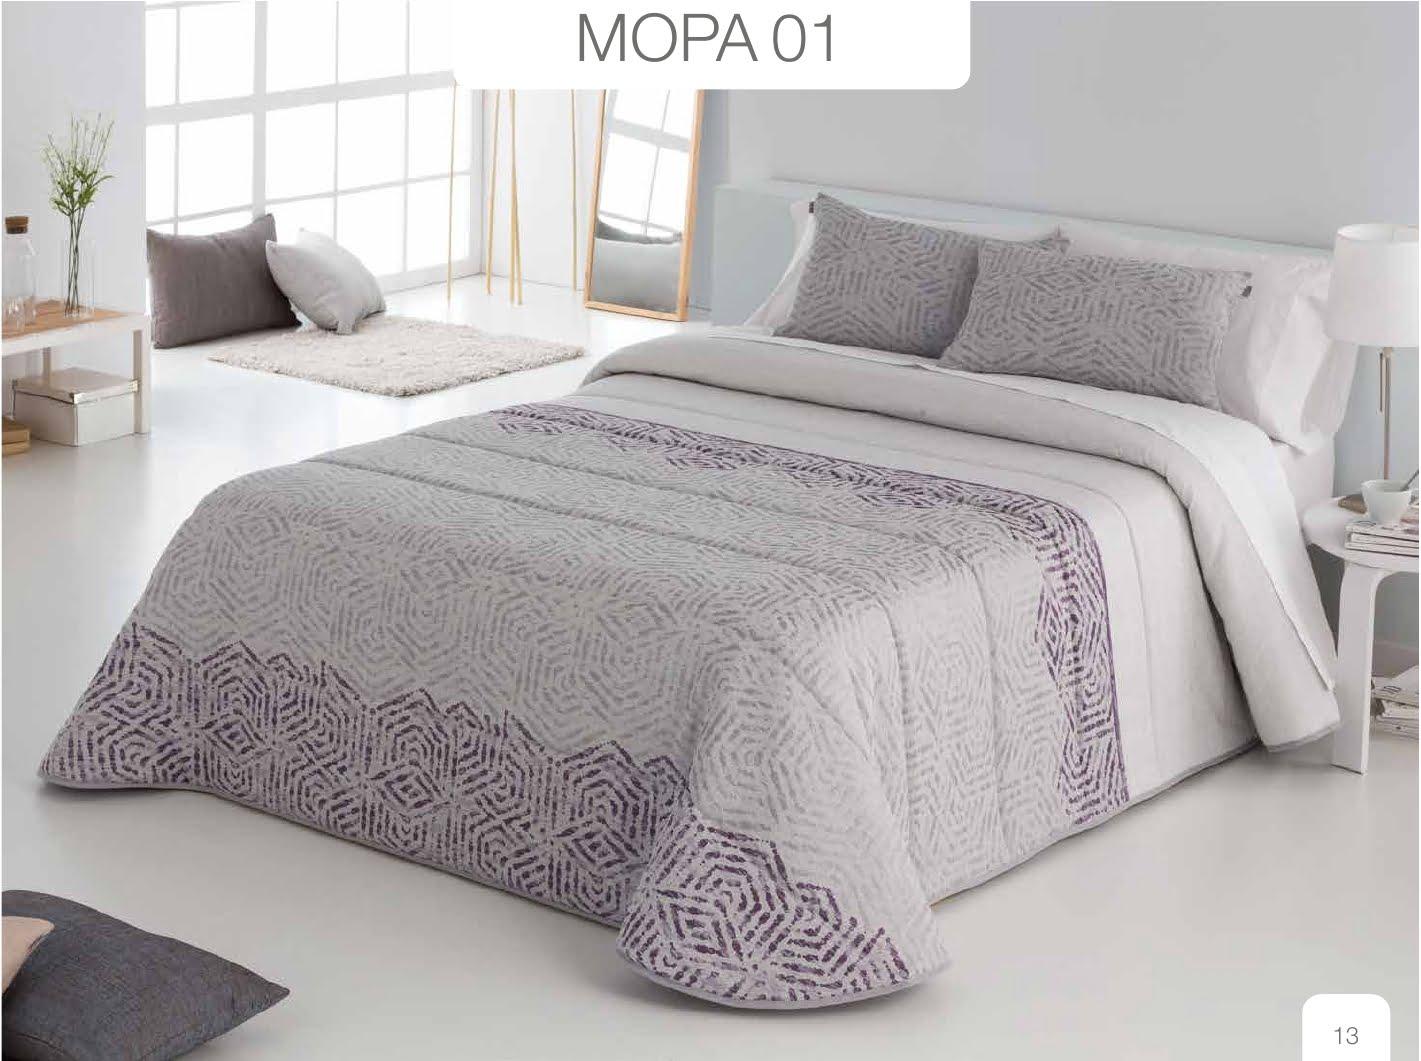 Conforter Bouti Jacquard Mopa Morado